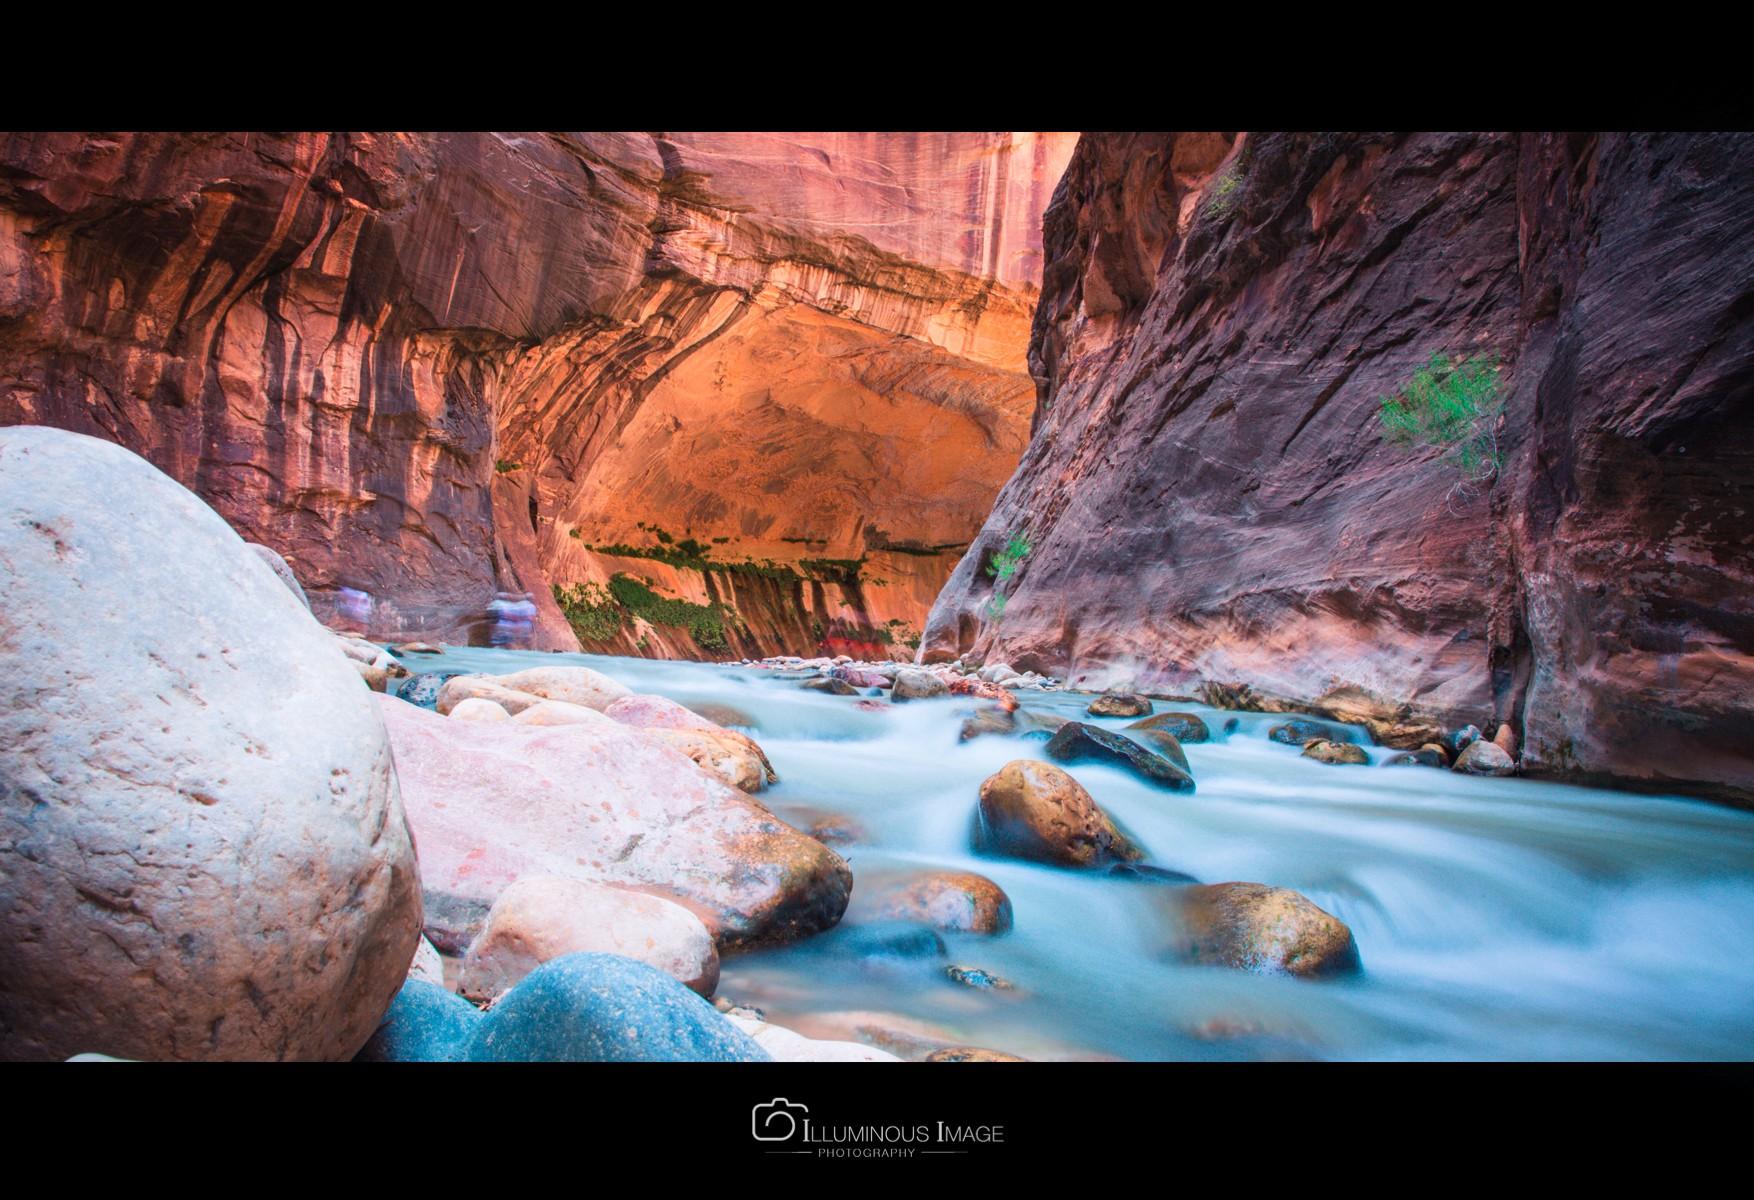 Zion National Park, Utah_illuminous_Image.jpg